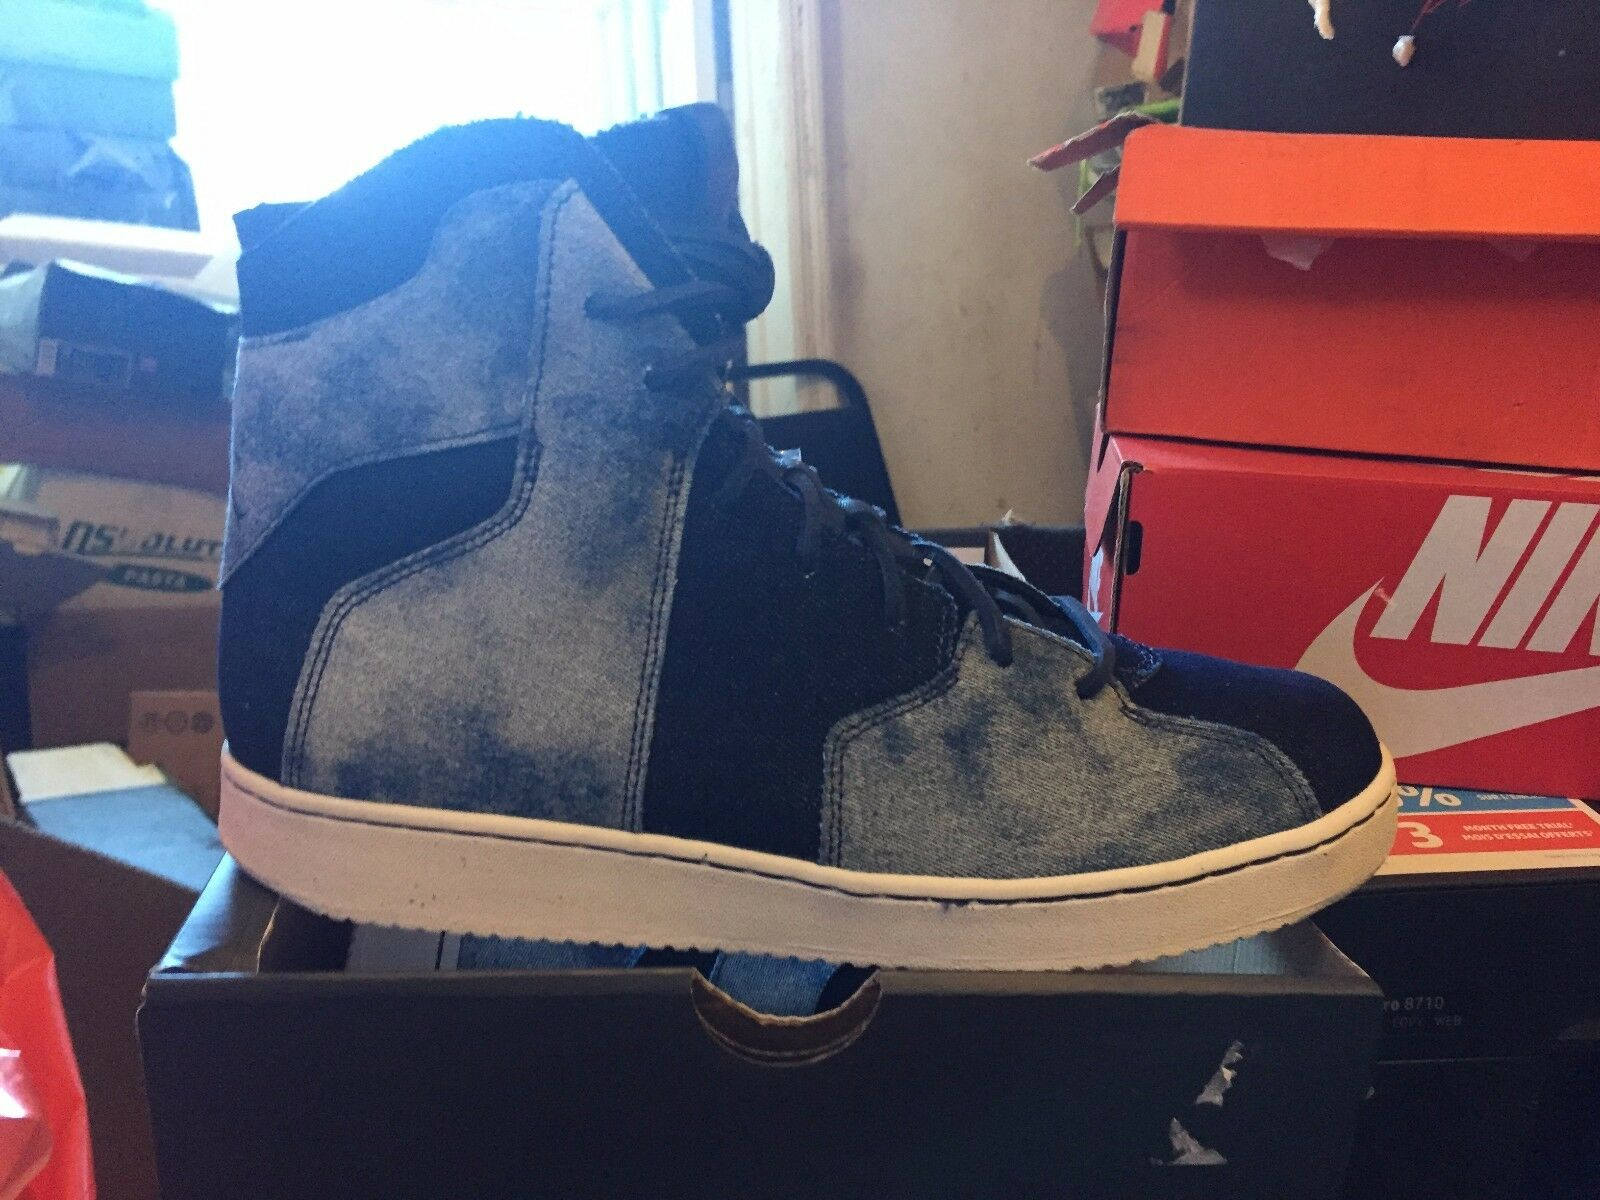 Nike Jordan Westbrook 0,2 Midnight Navy / Navy Marine bnib baratos tamaño 10,5 854563 406 baratos bnib zapatos de mujer zapatos de mujer 529a8a